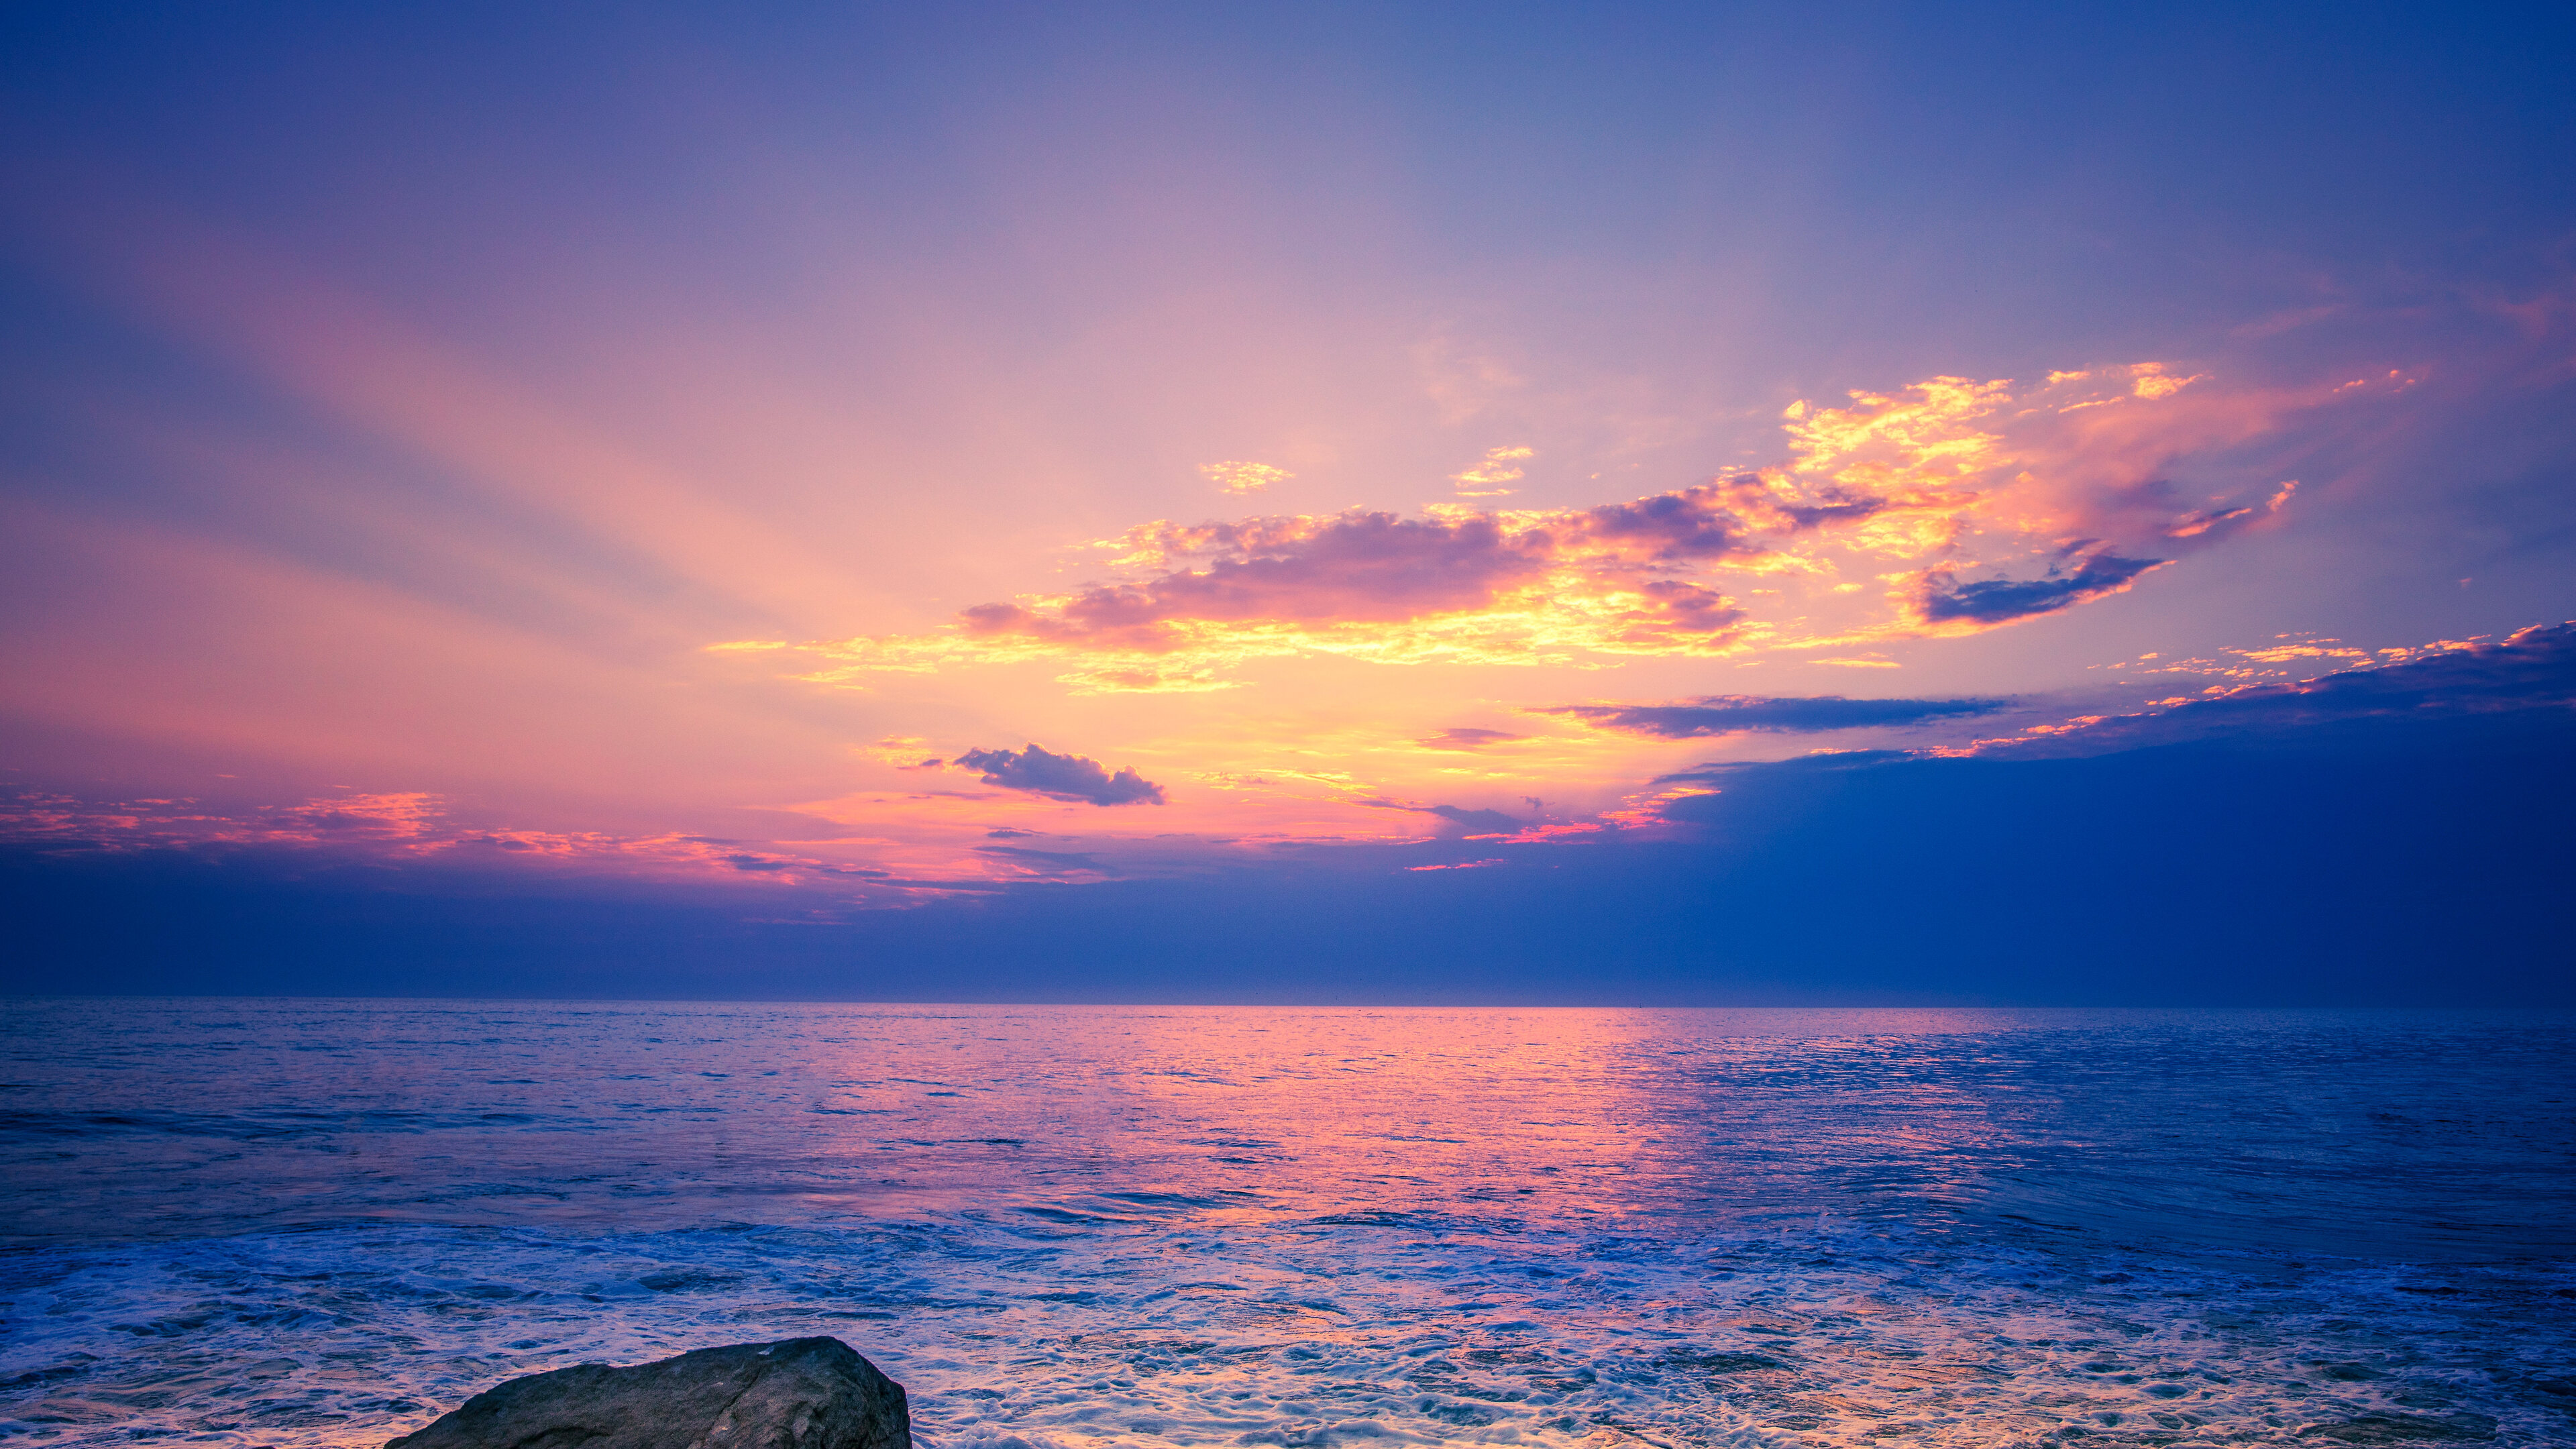 beach-rocks-ocean-5k-ib.jpg